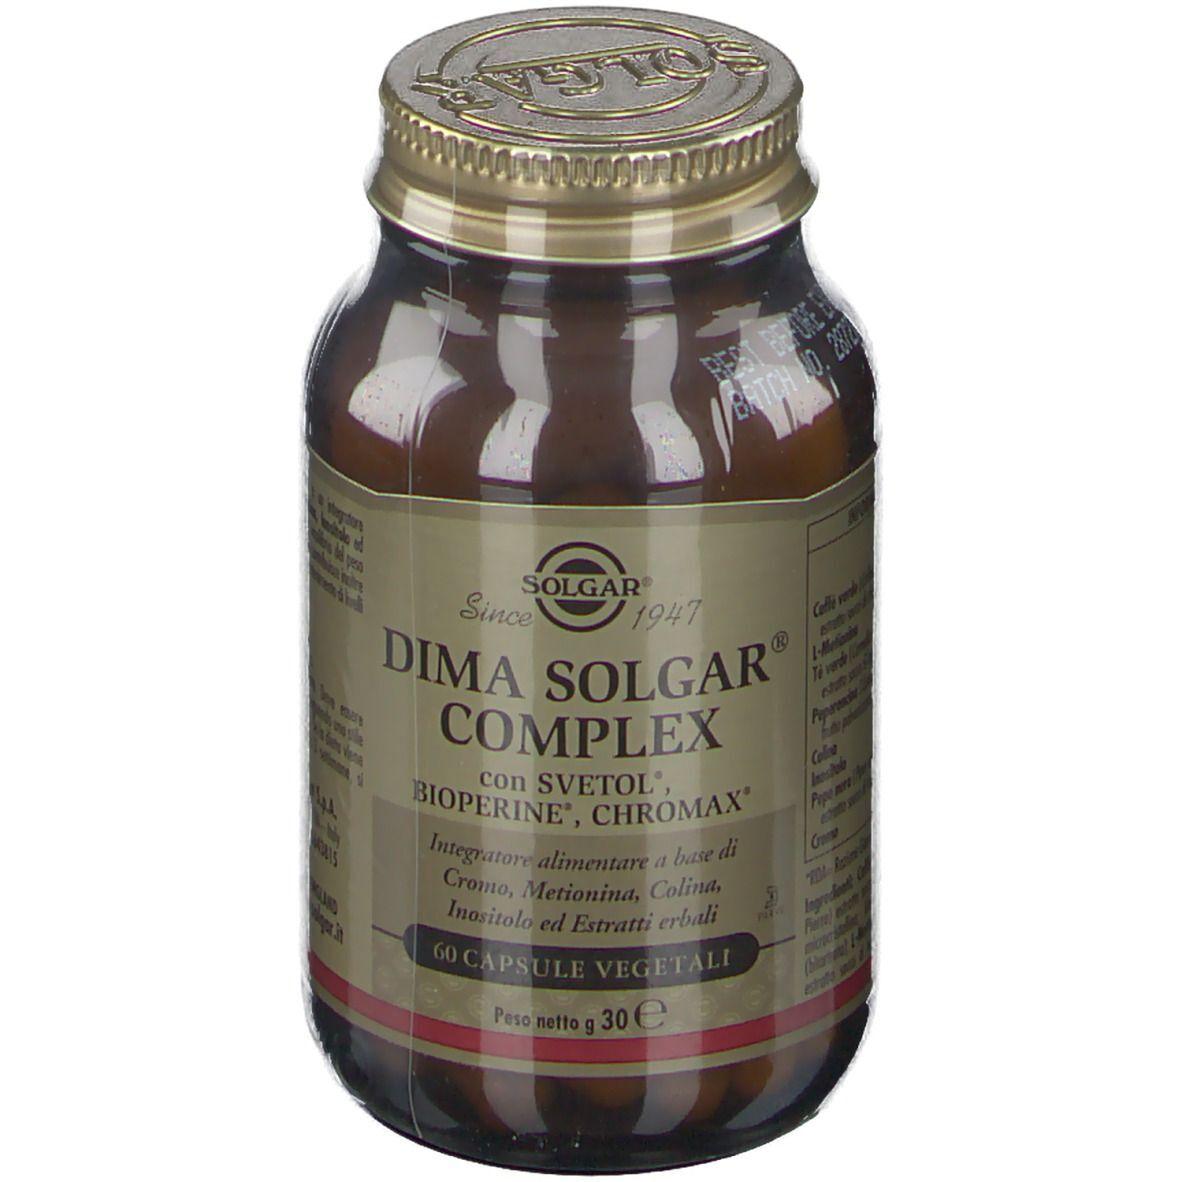 solgar it. multinutrient spa solgar dima solgar complex 60 pz capsule